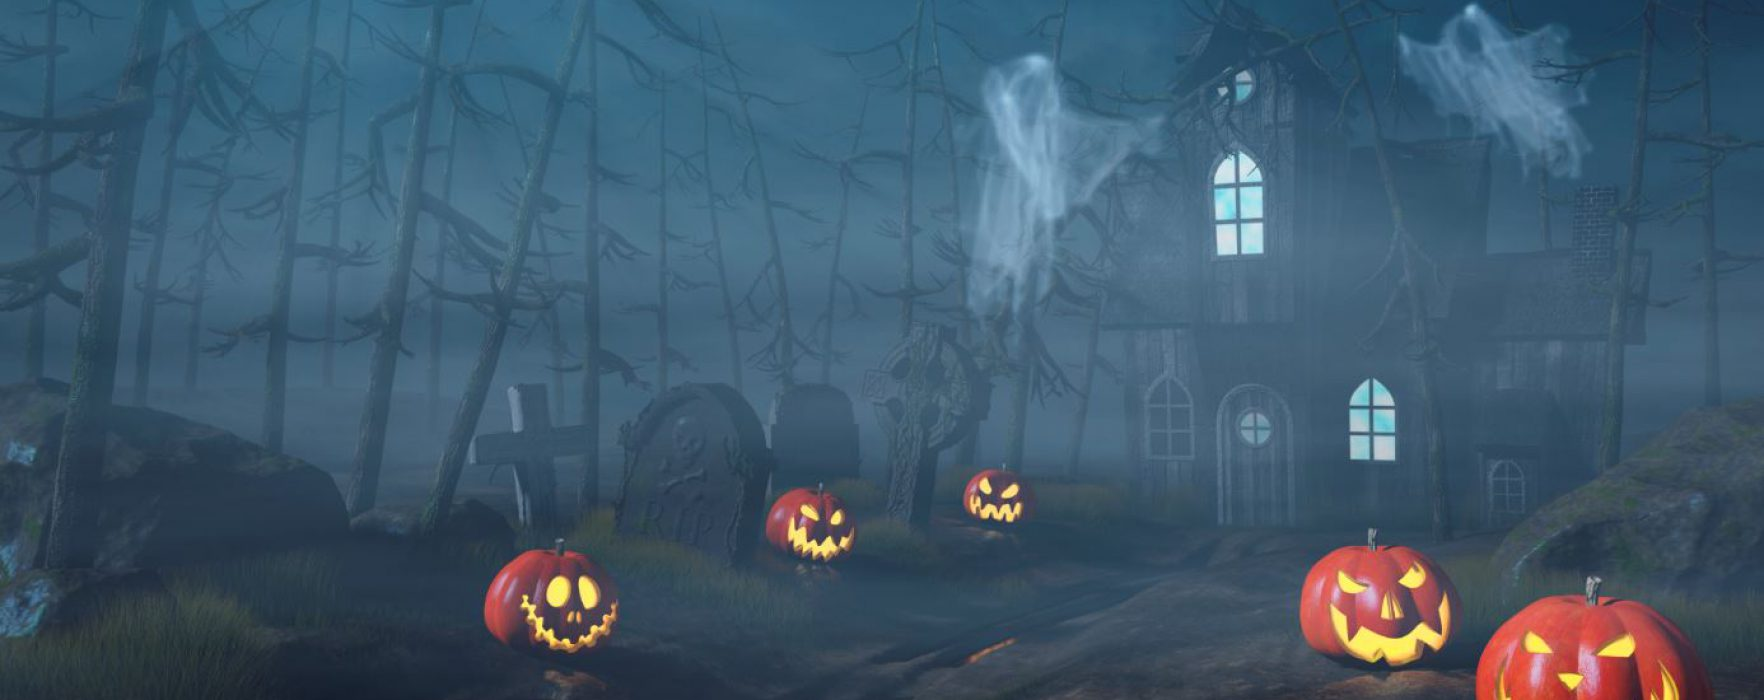 Que Hacer En Halloween En Casa Ideas Caseras De Miedo Aedas Homes - Imagenes-terrorificas-de-halloween